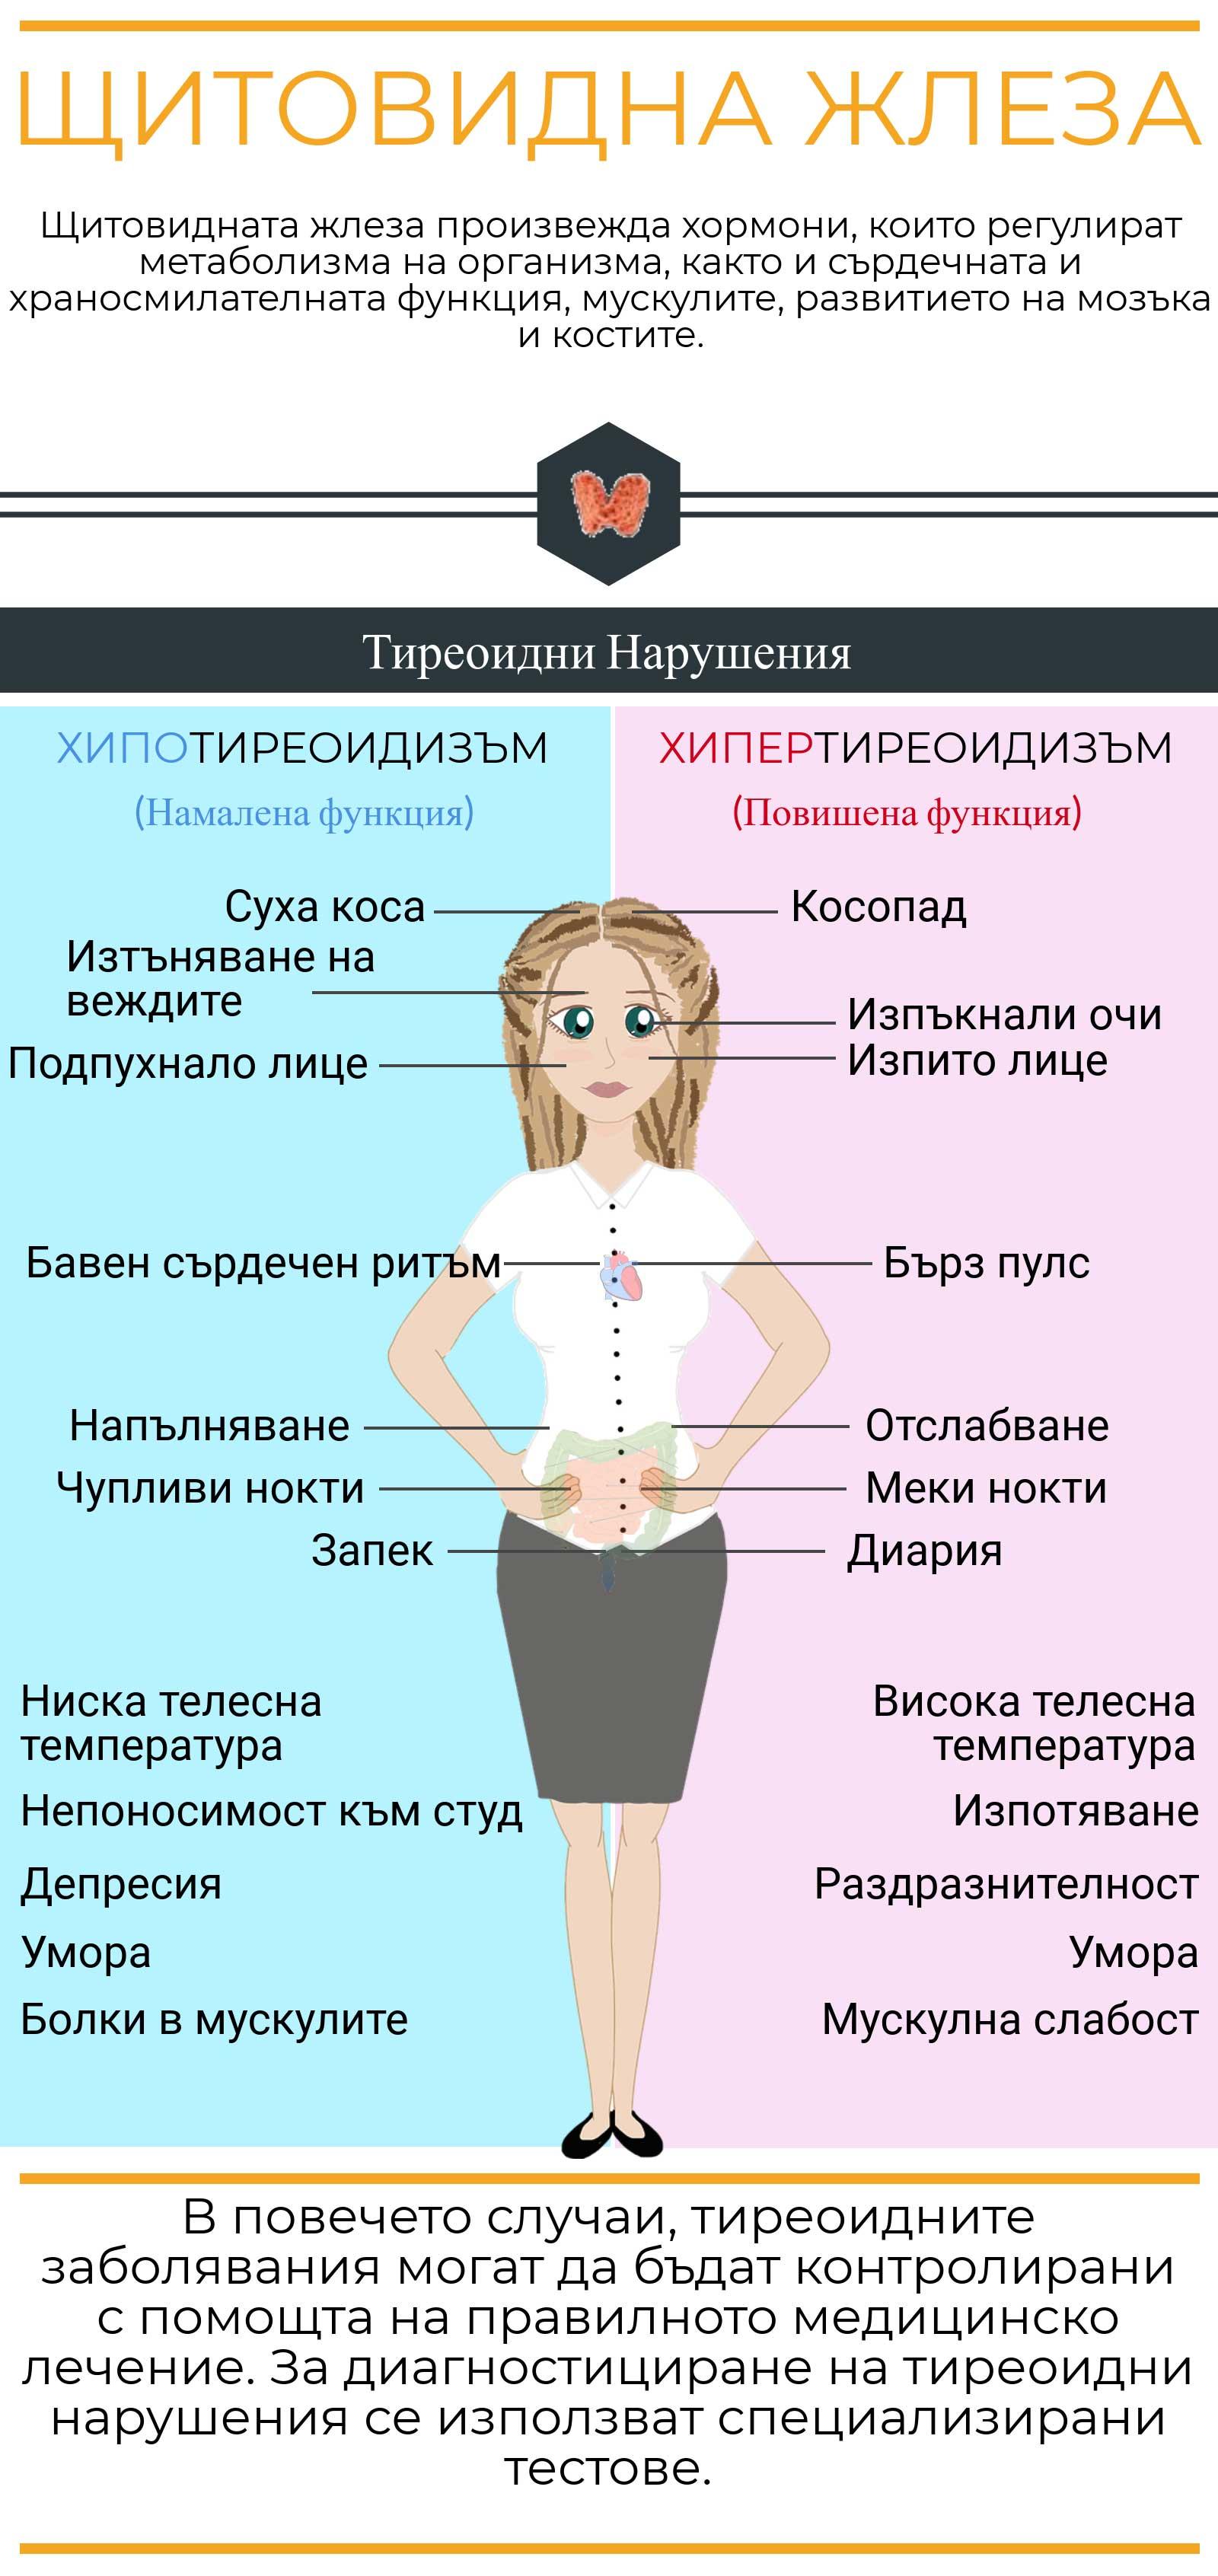 щитовидна жлеза лечение